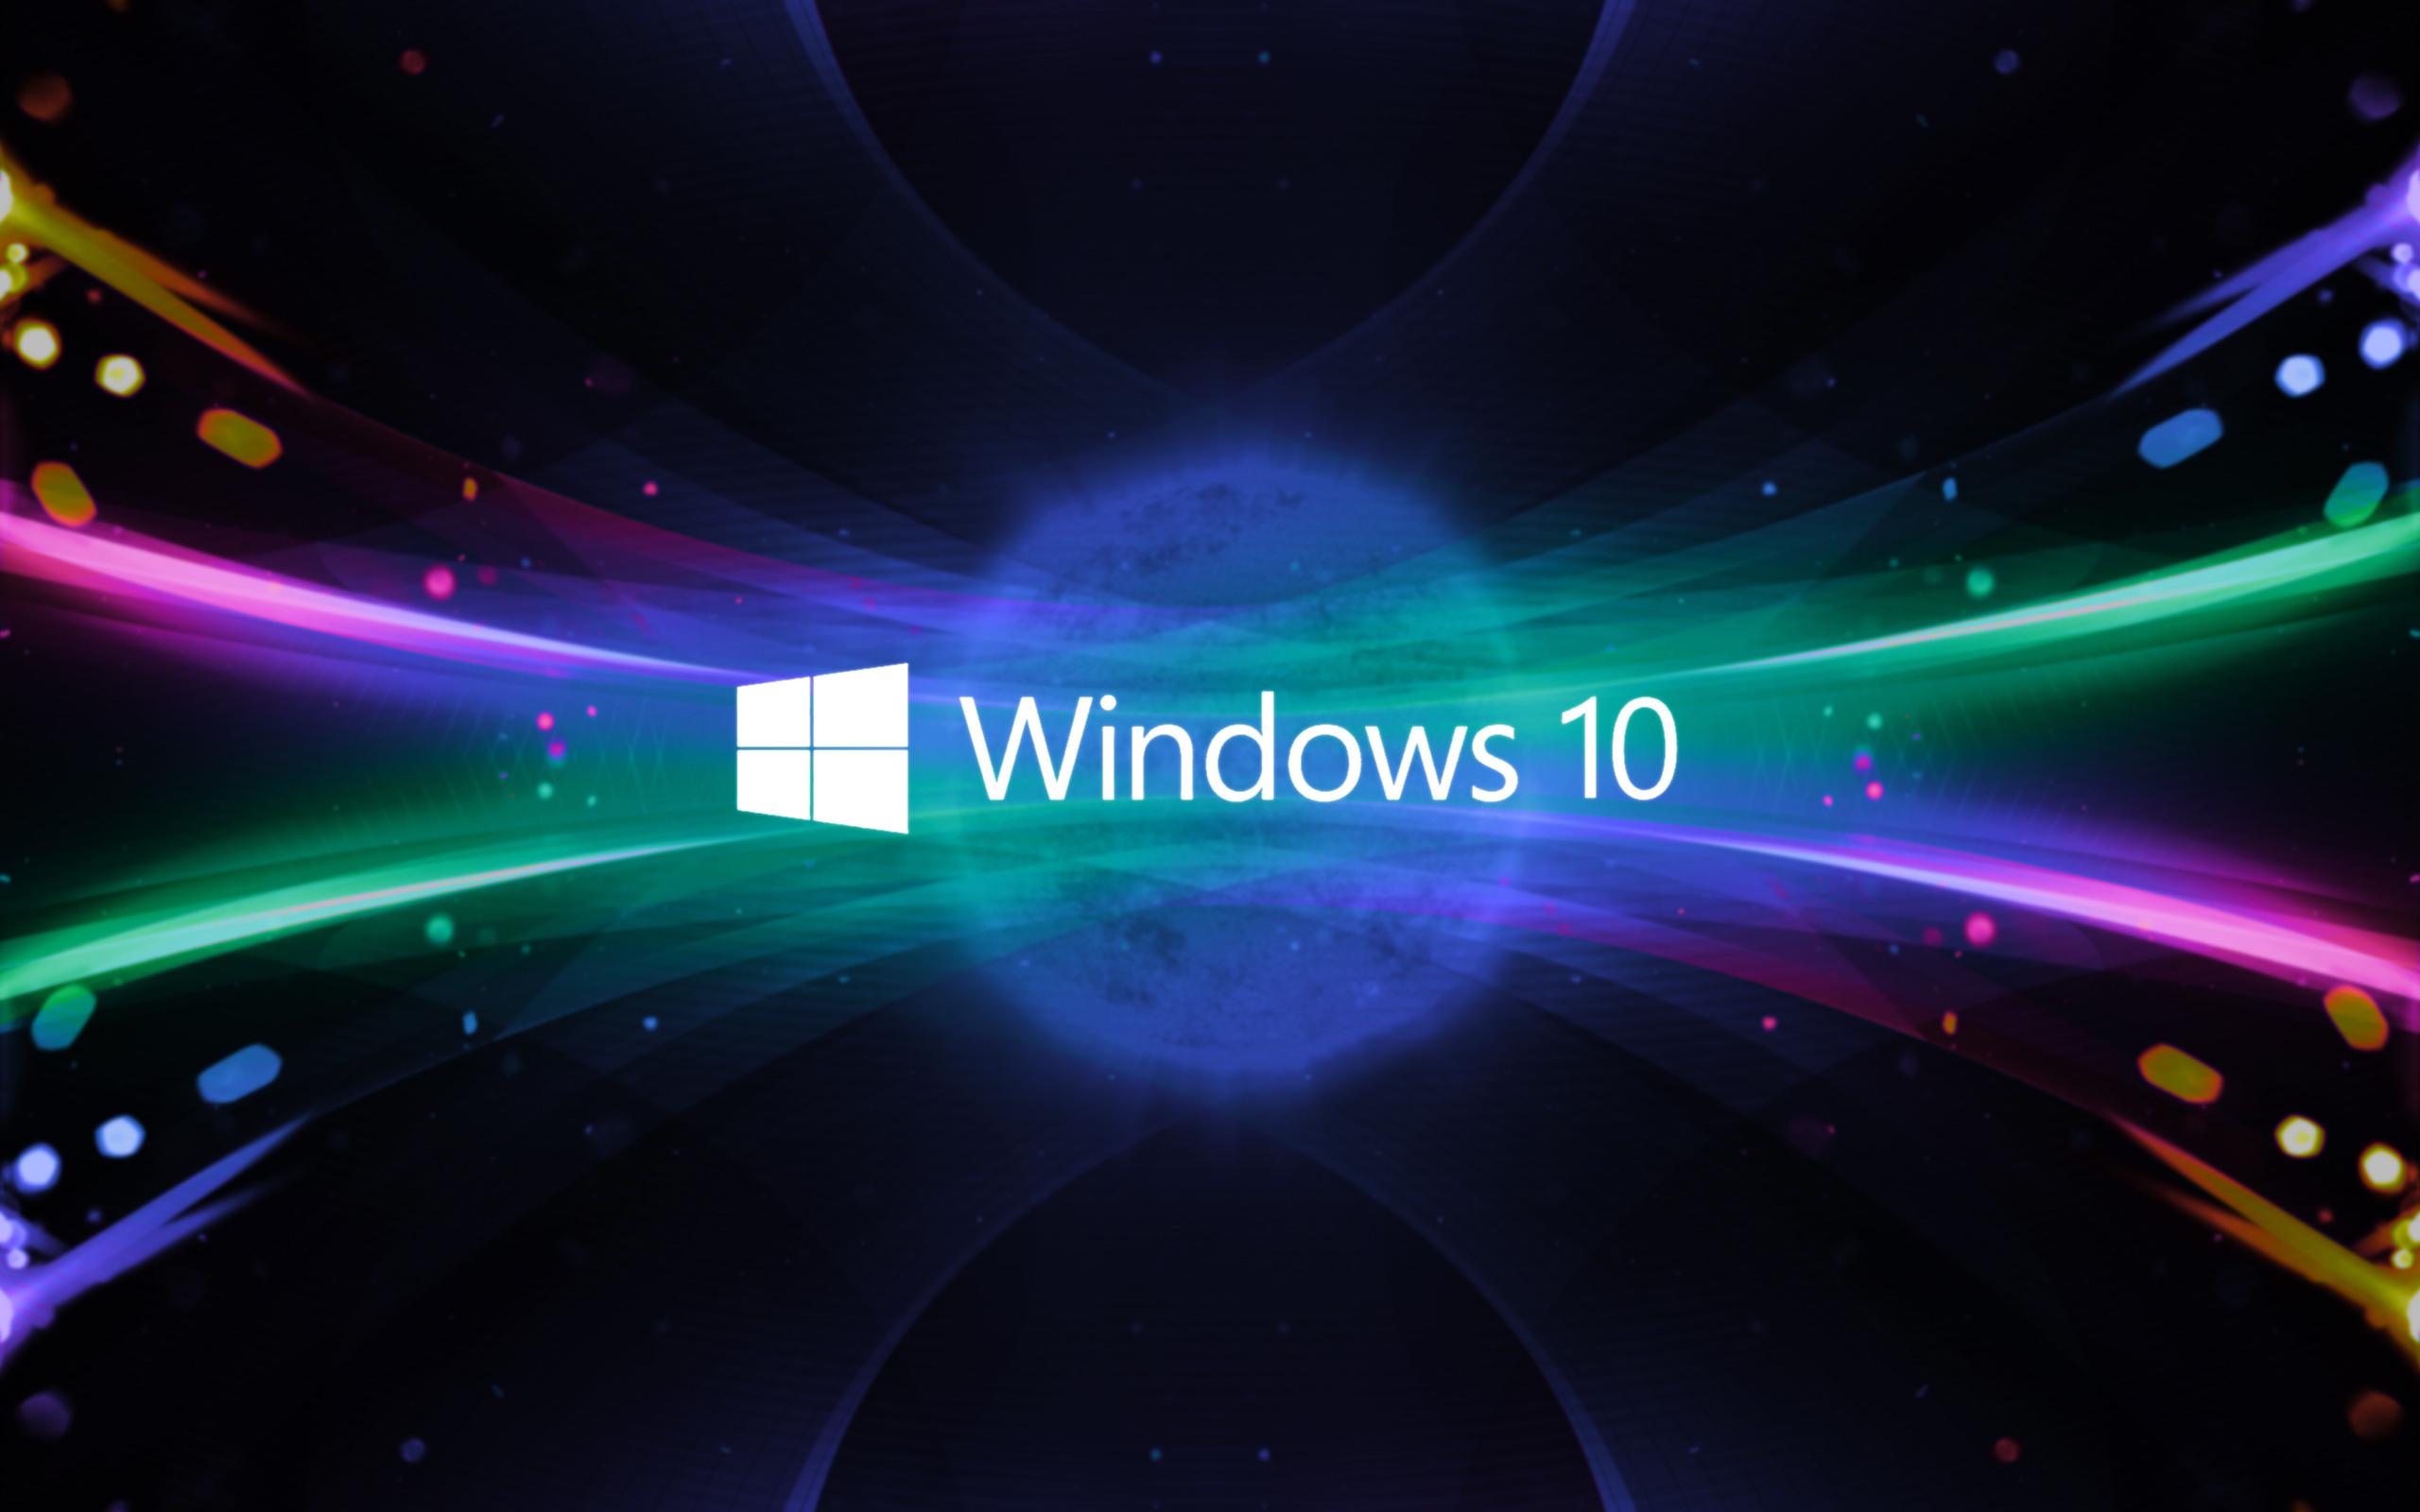 Windows-10-HD-Wallpaper-7